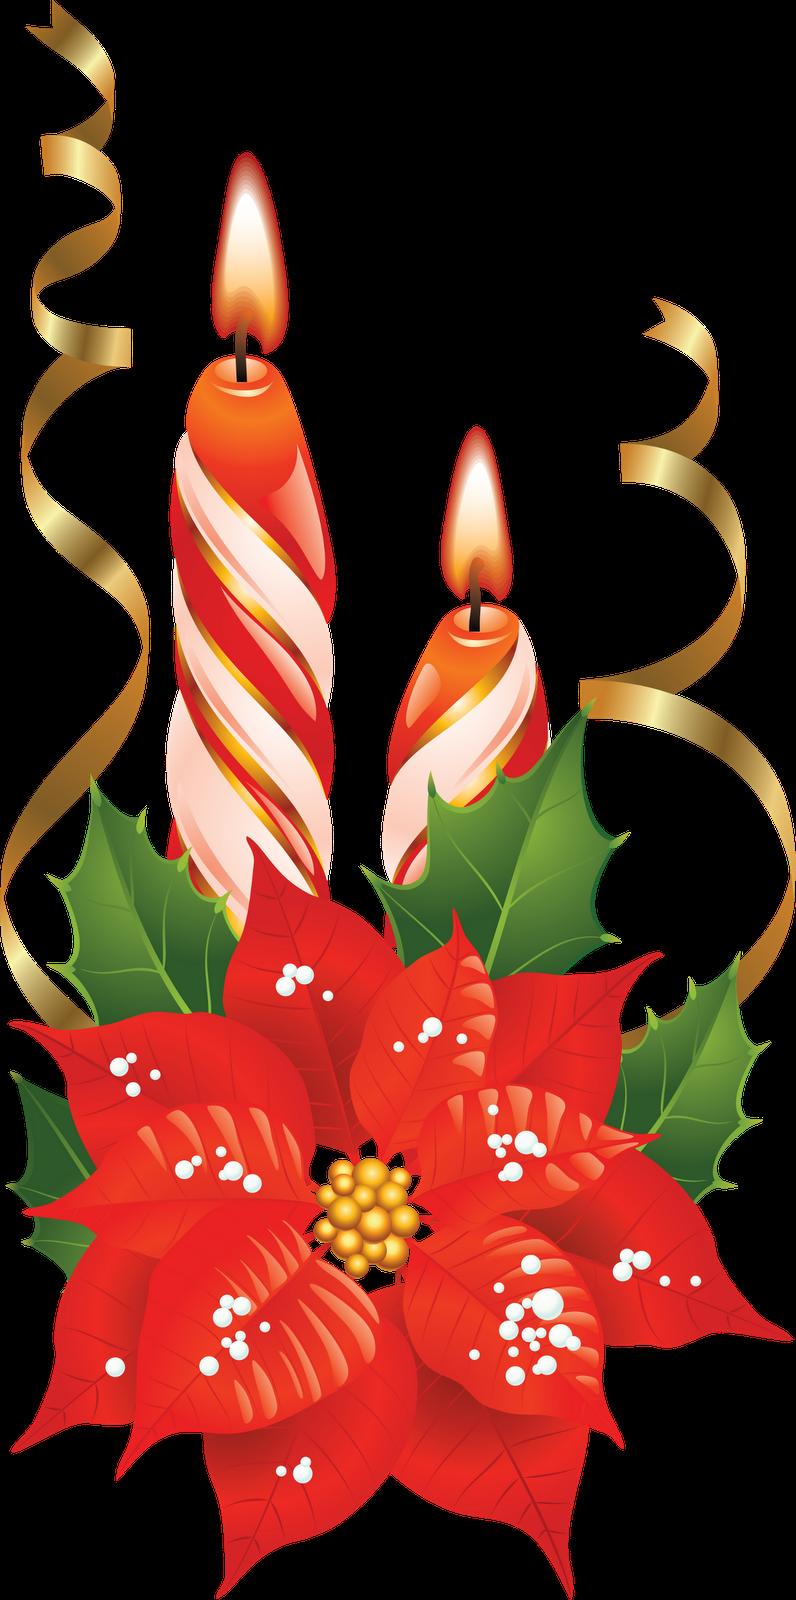 Enfeites de natal png. Poinsettia clipart poinsettia corner